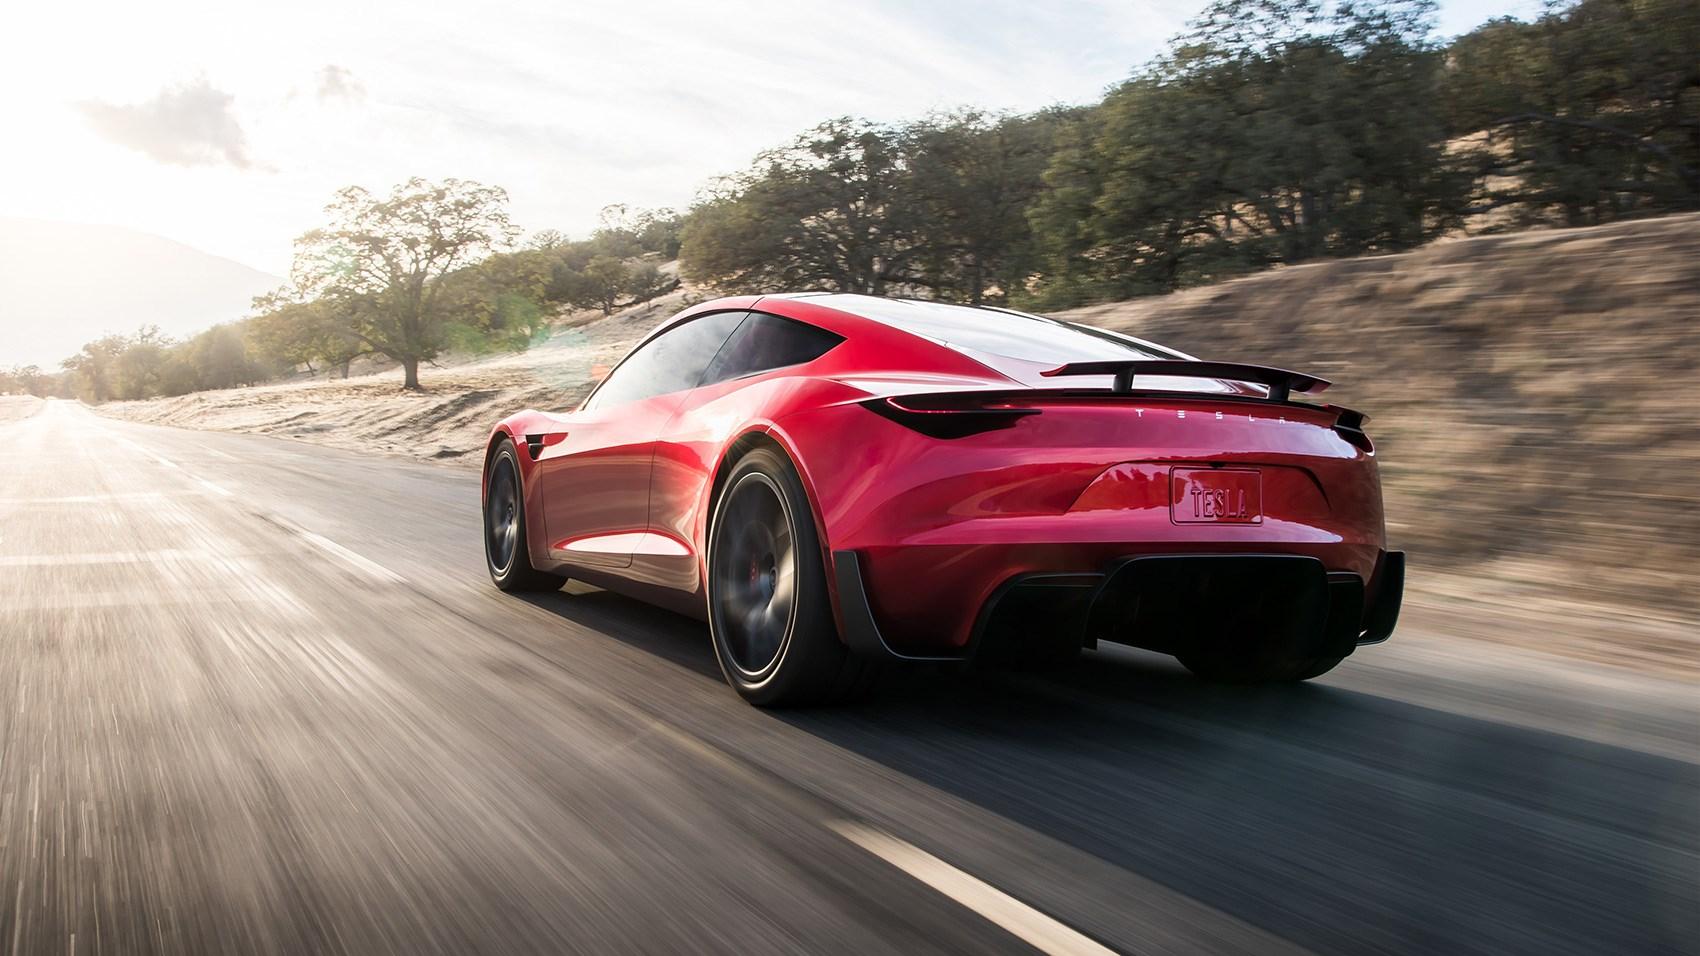 New Tesla Roadster Musk Hints At Rocket Ed Performance